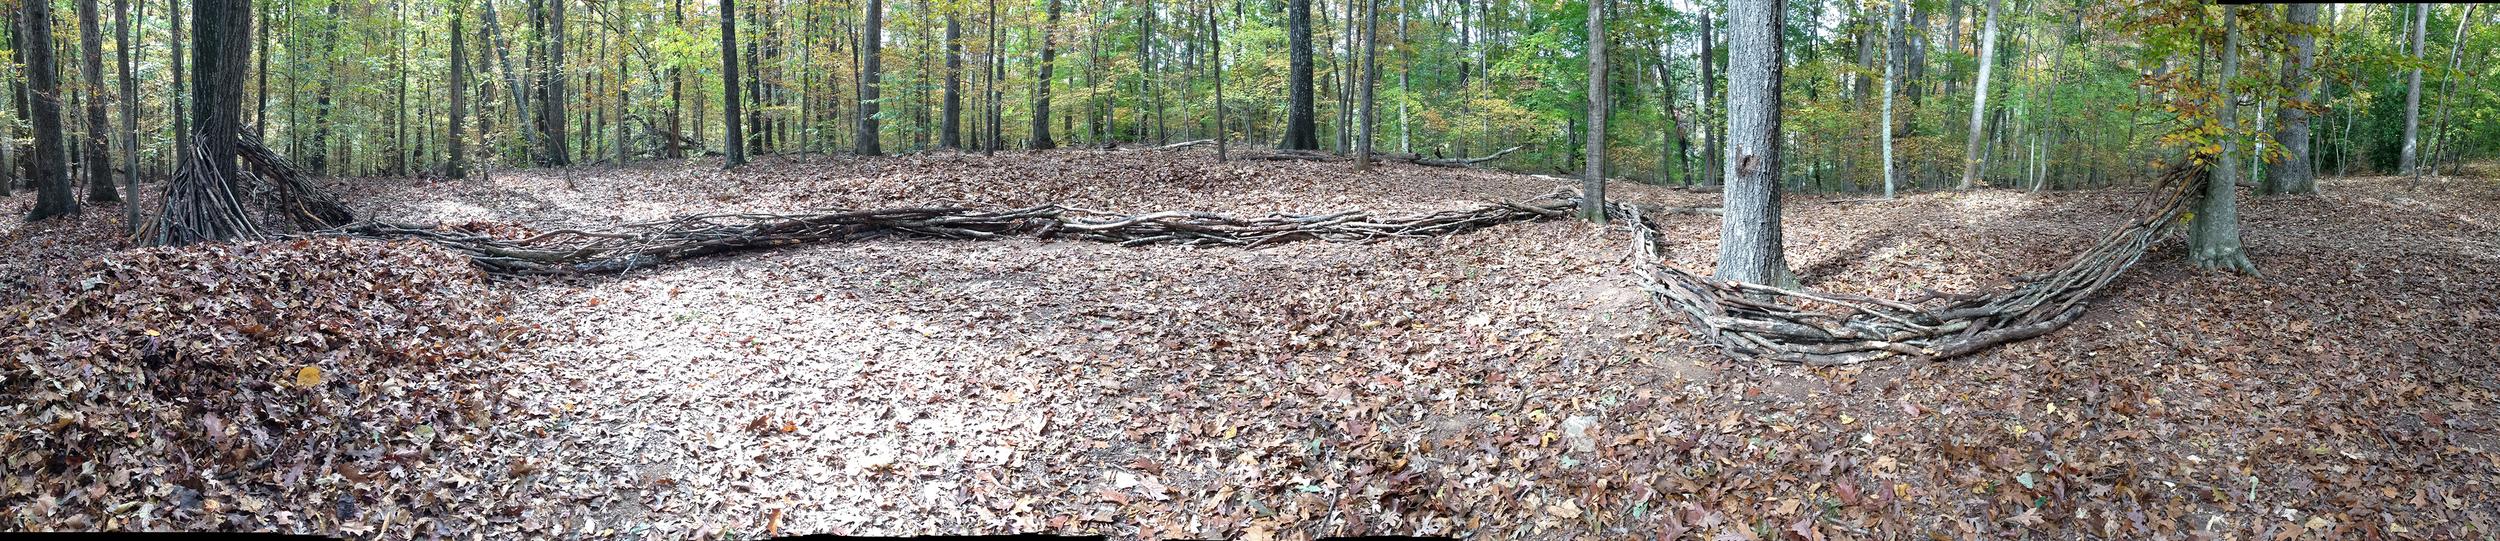 Wooden Trail. State Botanical Garden of Georgia. Athens, GA. Fall 2013